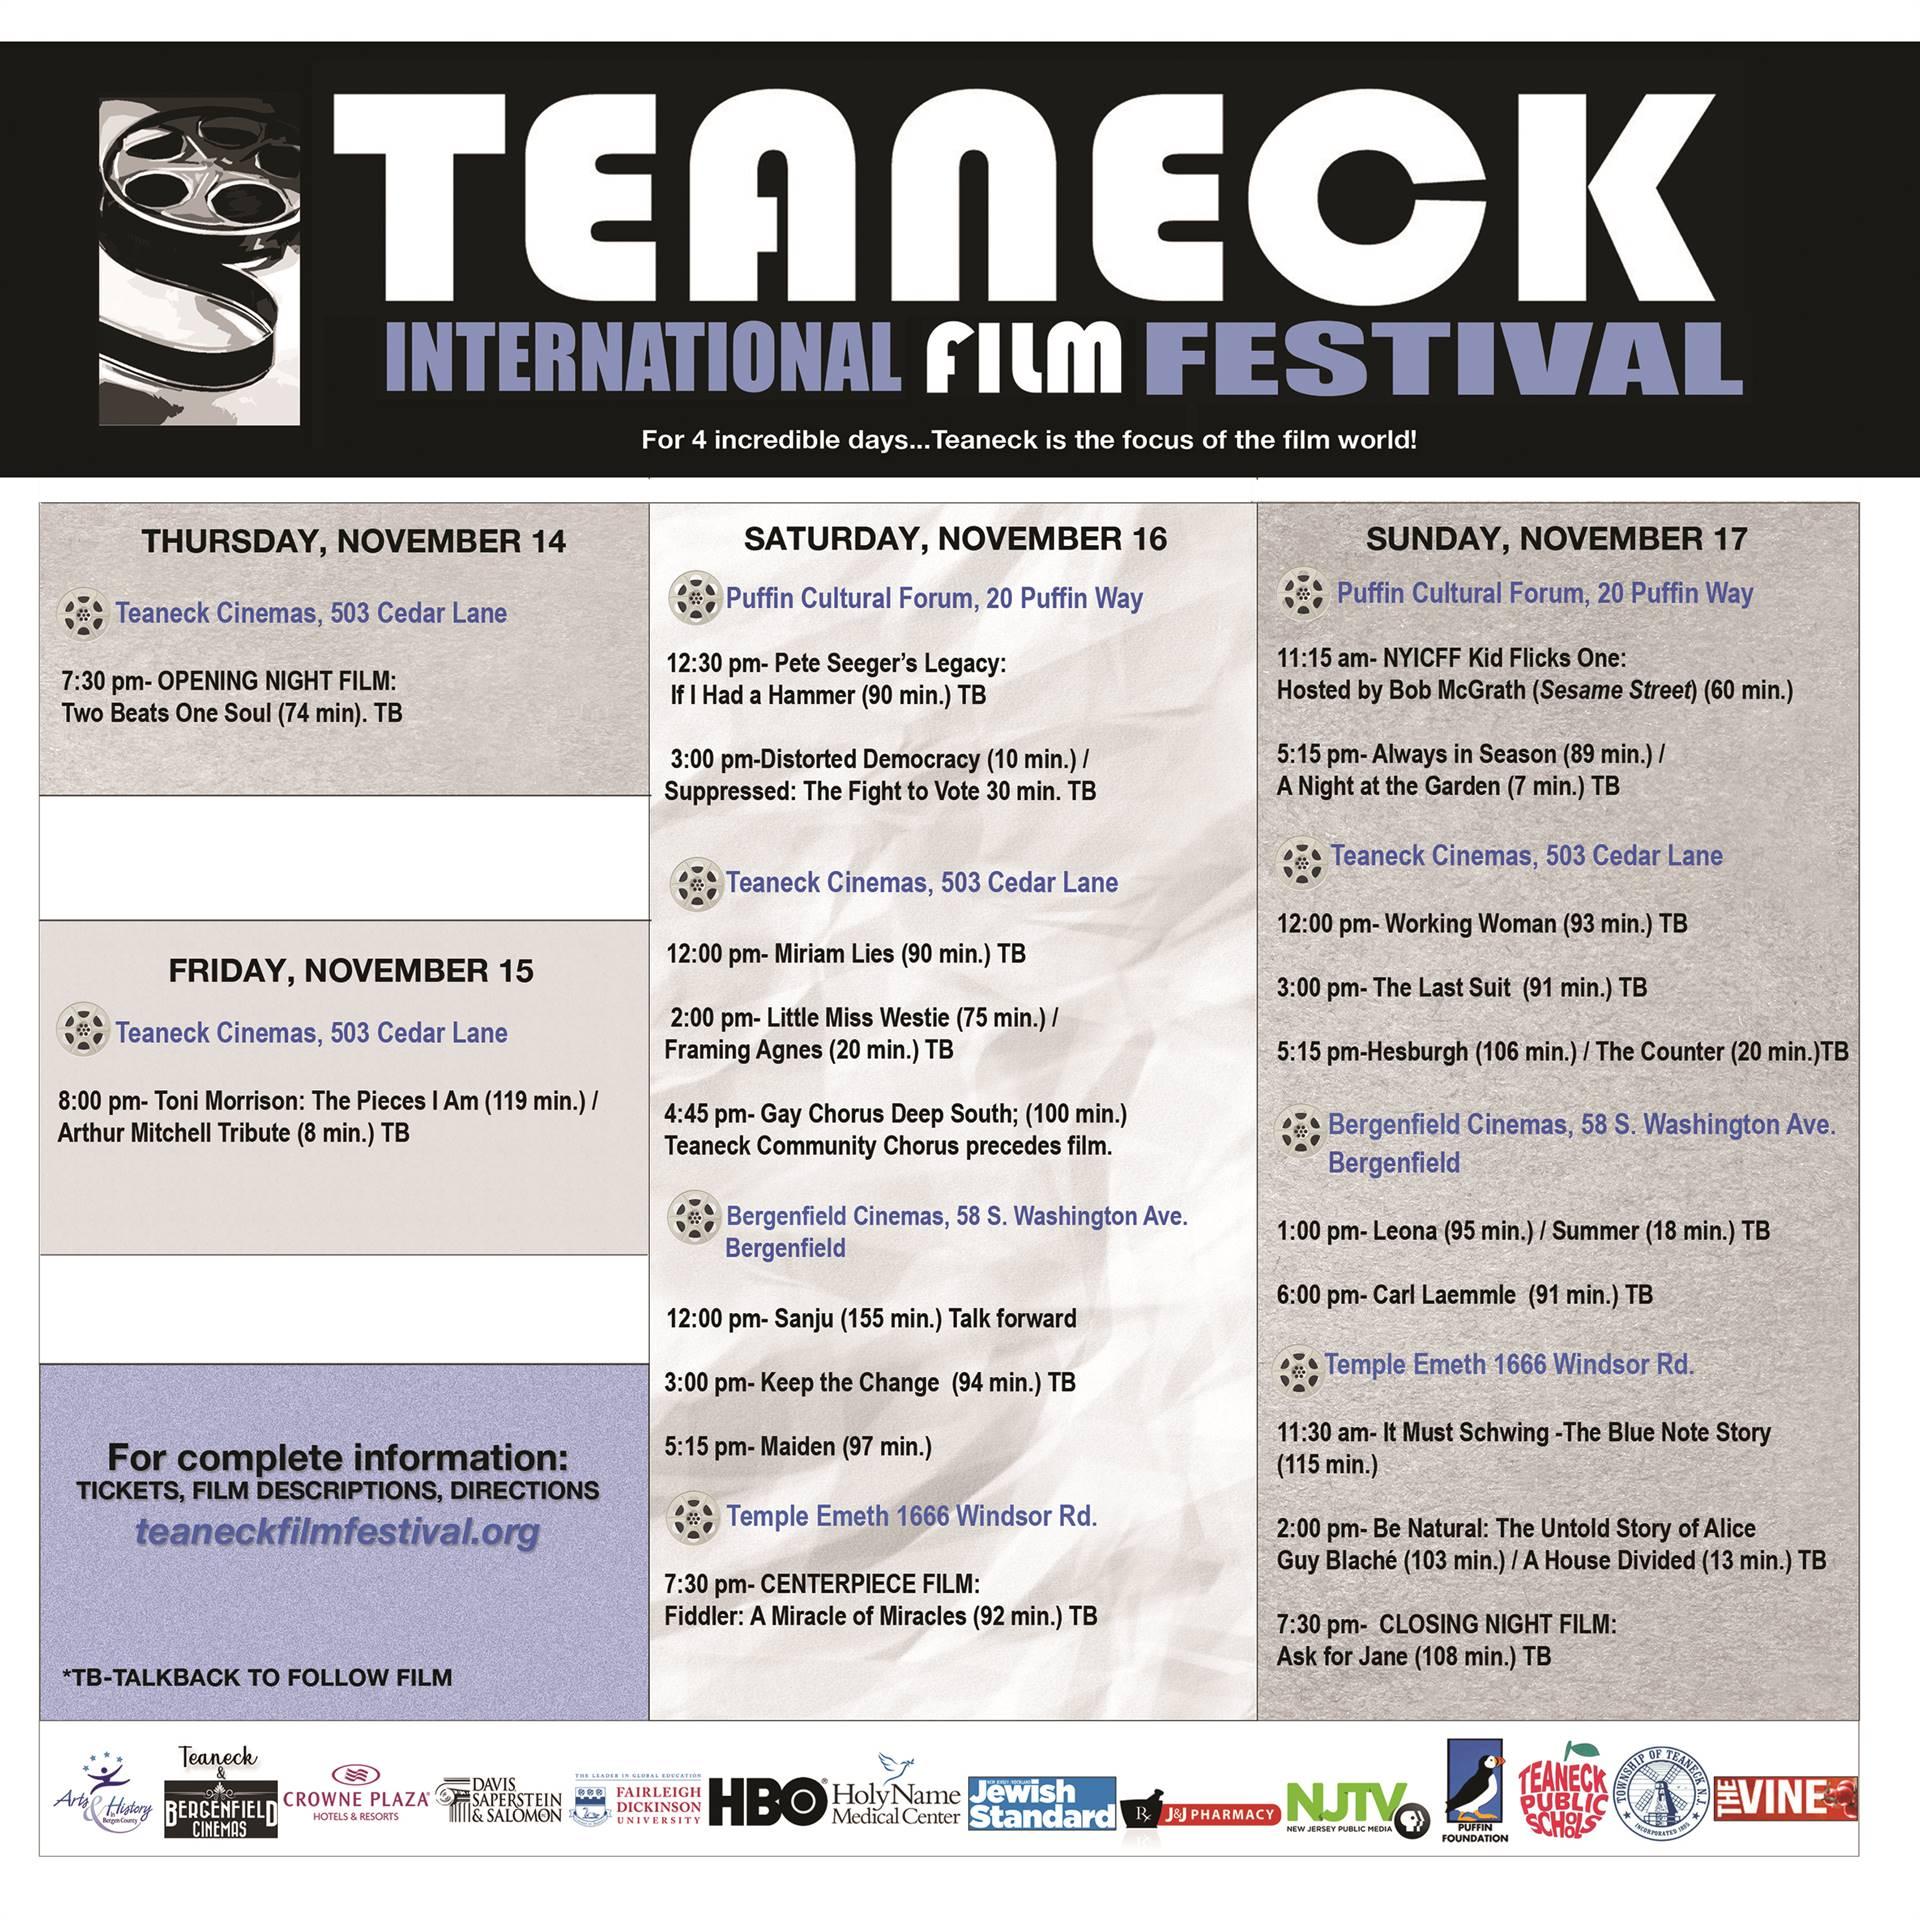 TIFF Schedule 2019